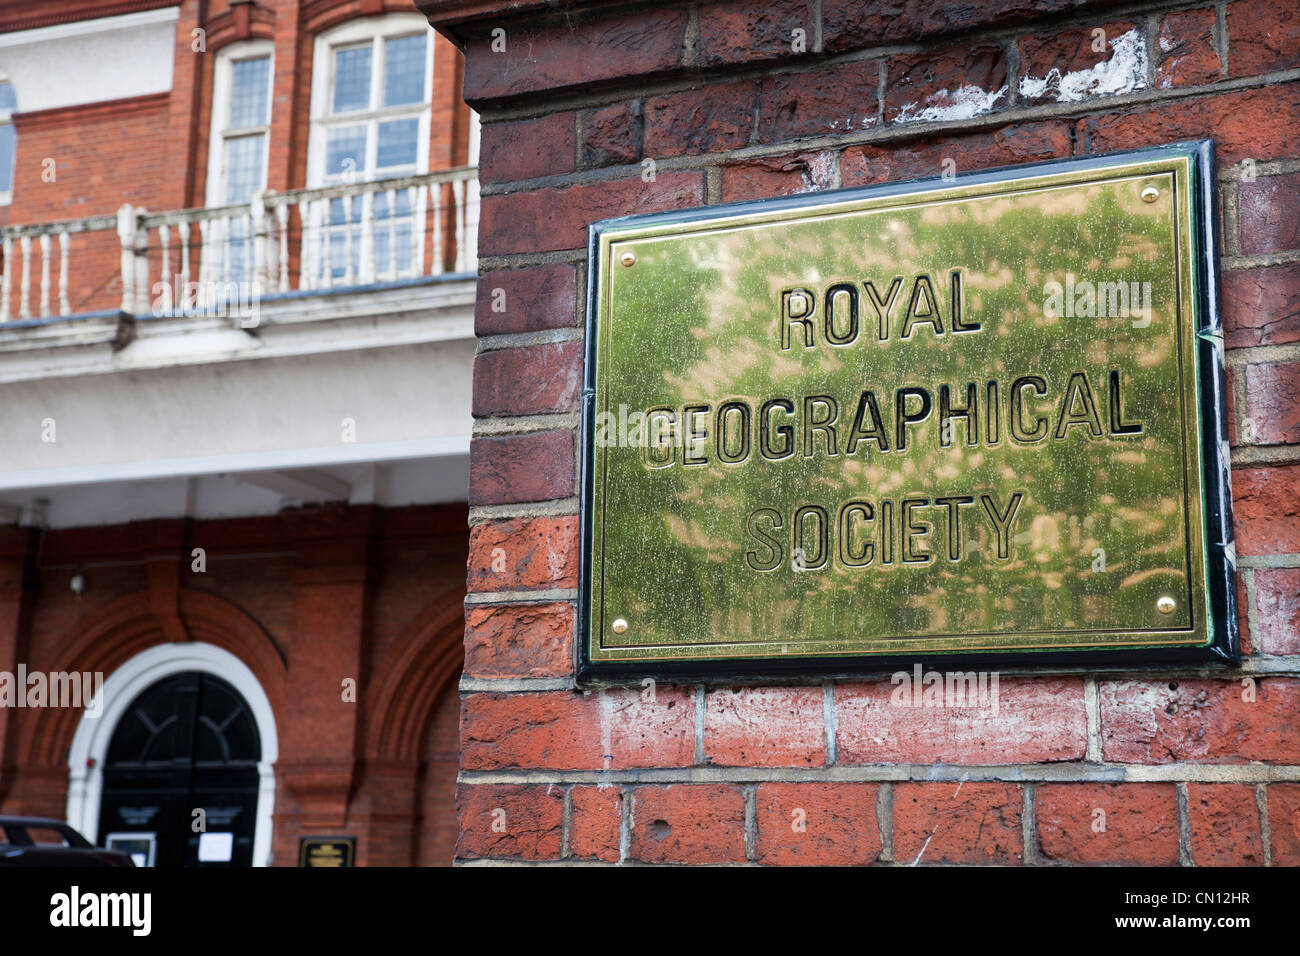 Royal Geographical Society, London, UK - Stock Image